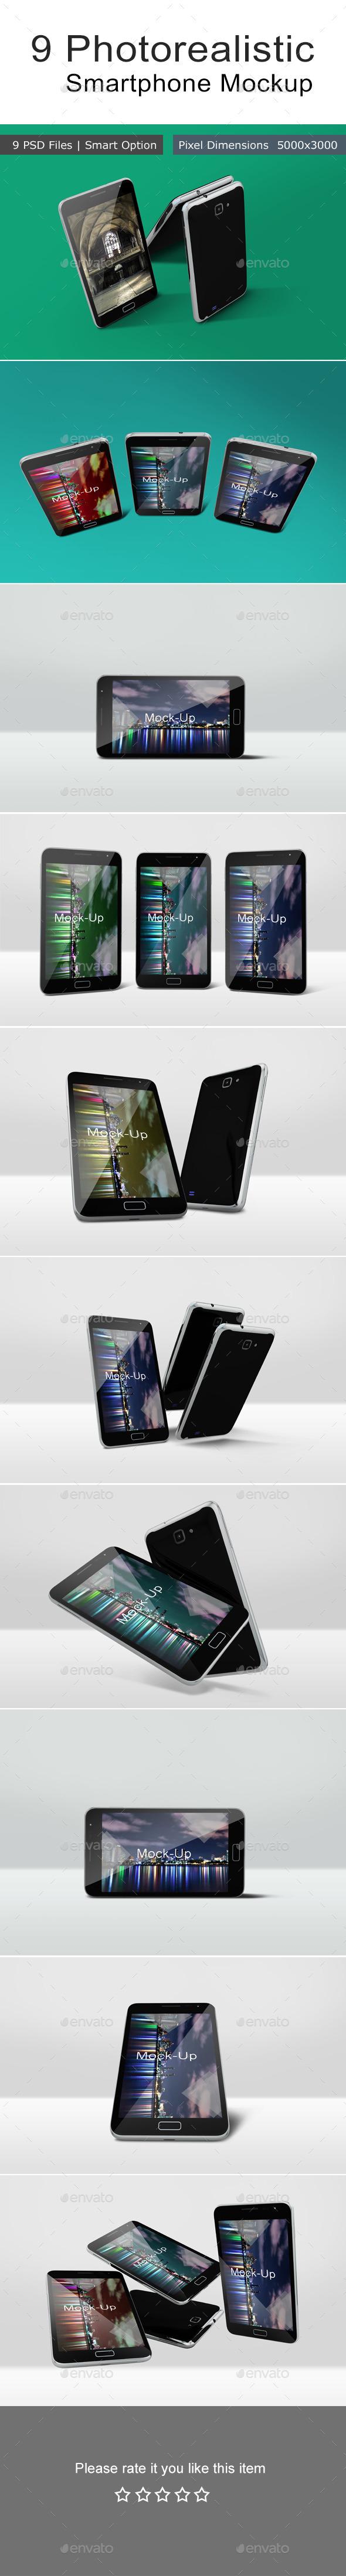 GraphicRiver 9 Photorealistic Smartphone Mockup 11364286